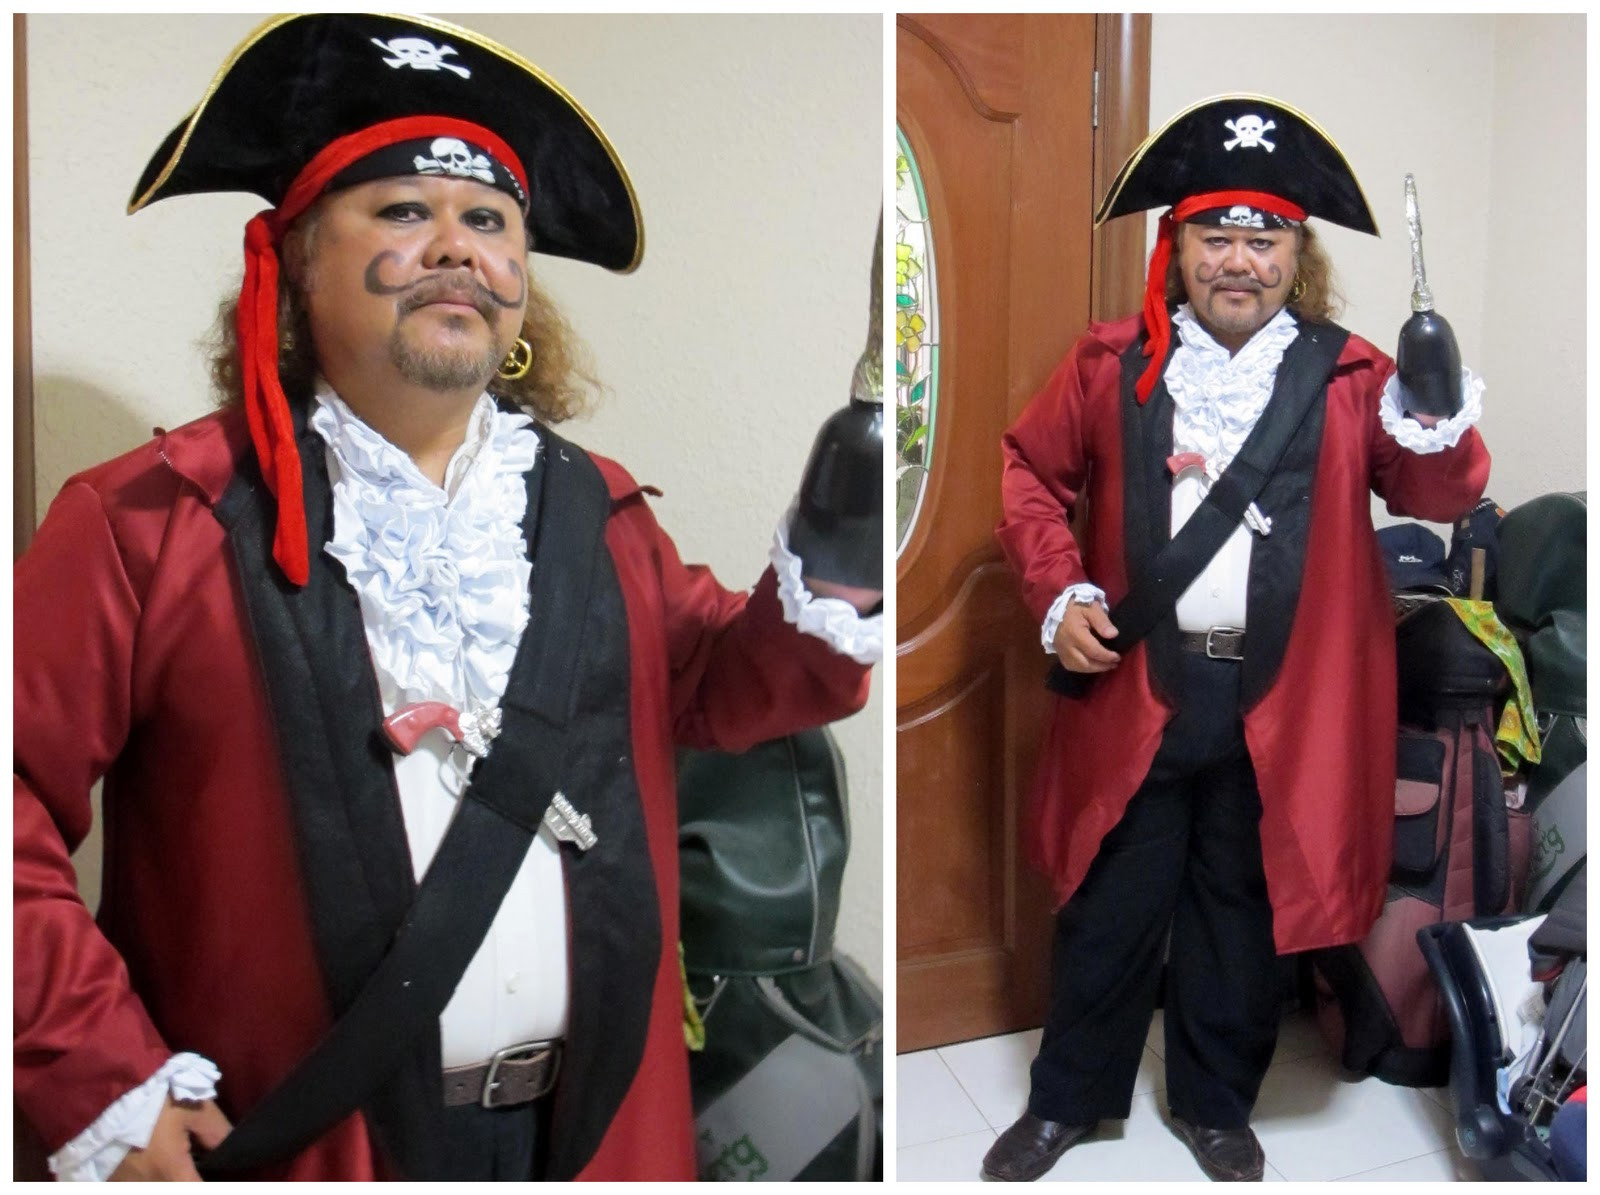 DIY Captain Hook Costumes  Rabbit The Penguin DIY Captain Hook Costume